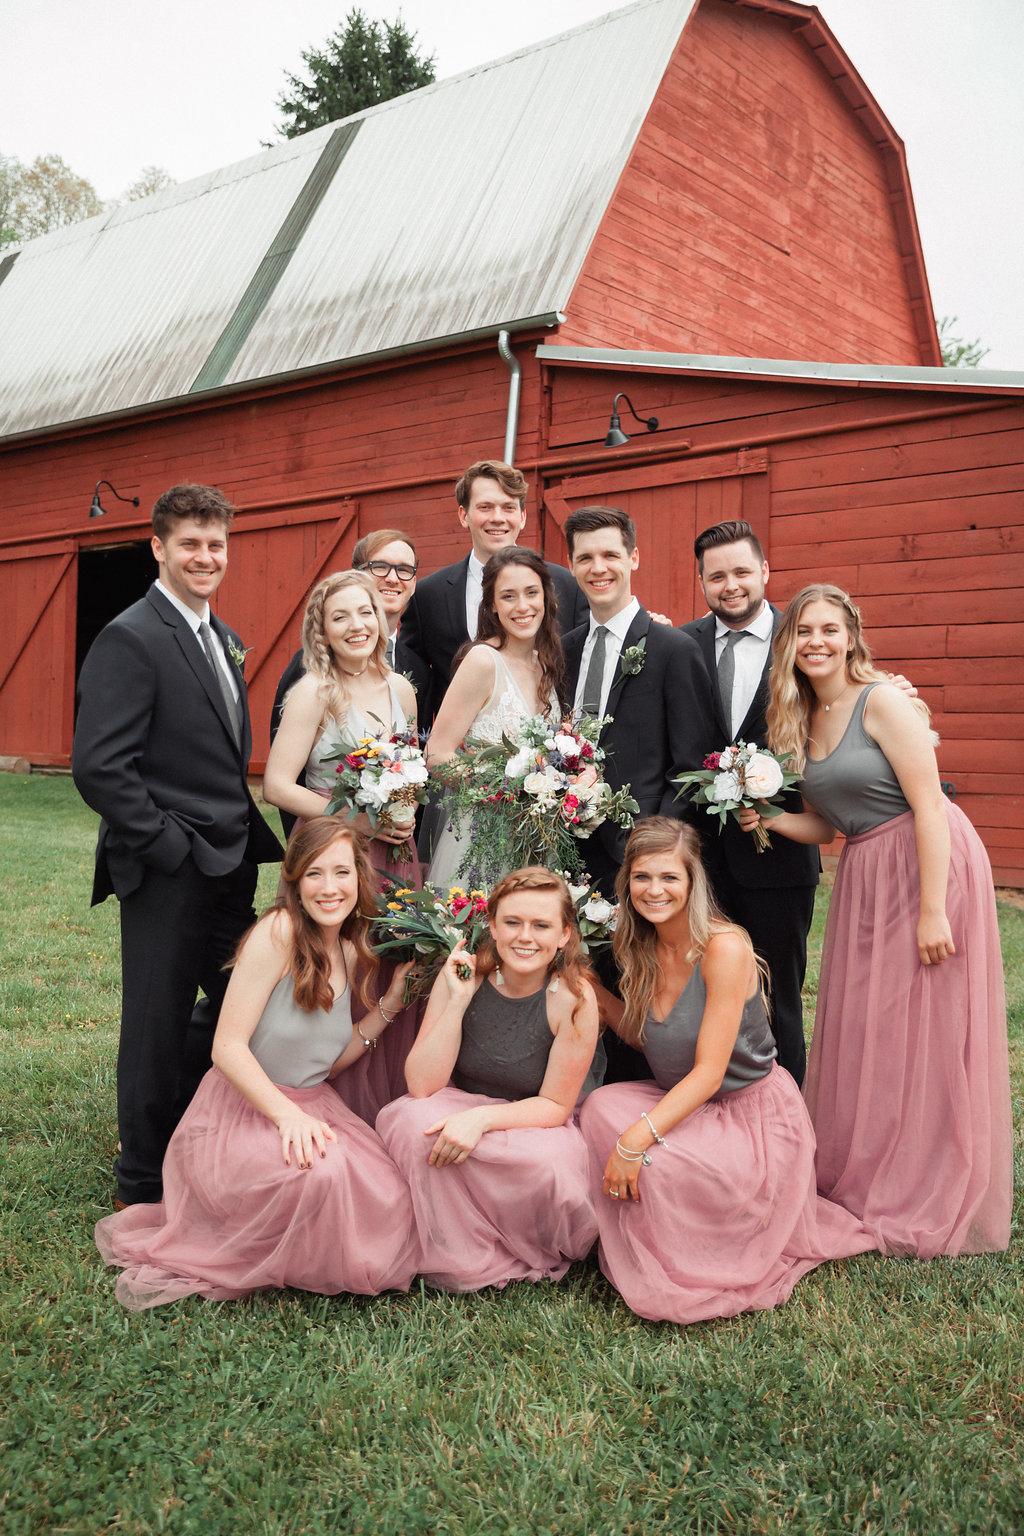 Honeysuckle-Hill-Weddings-Mallory-Patrick-80.jpg